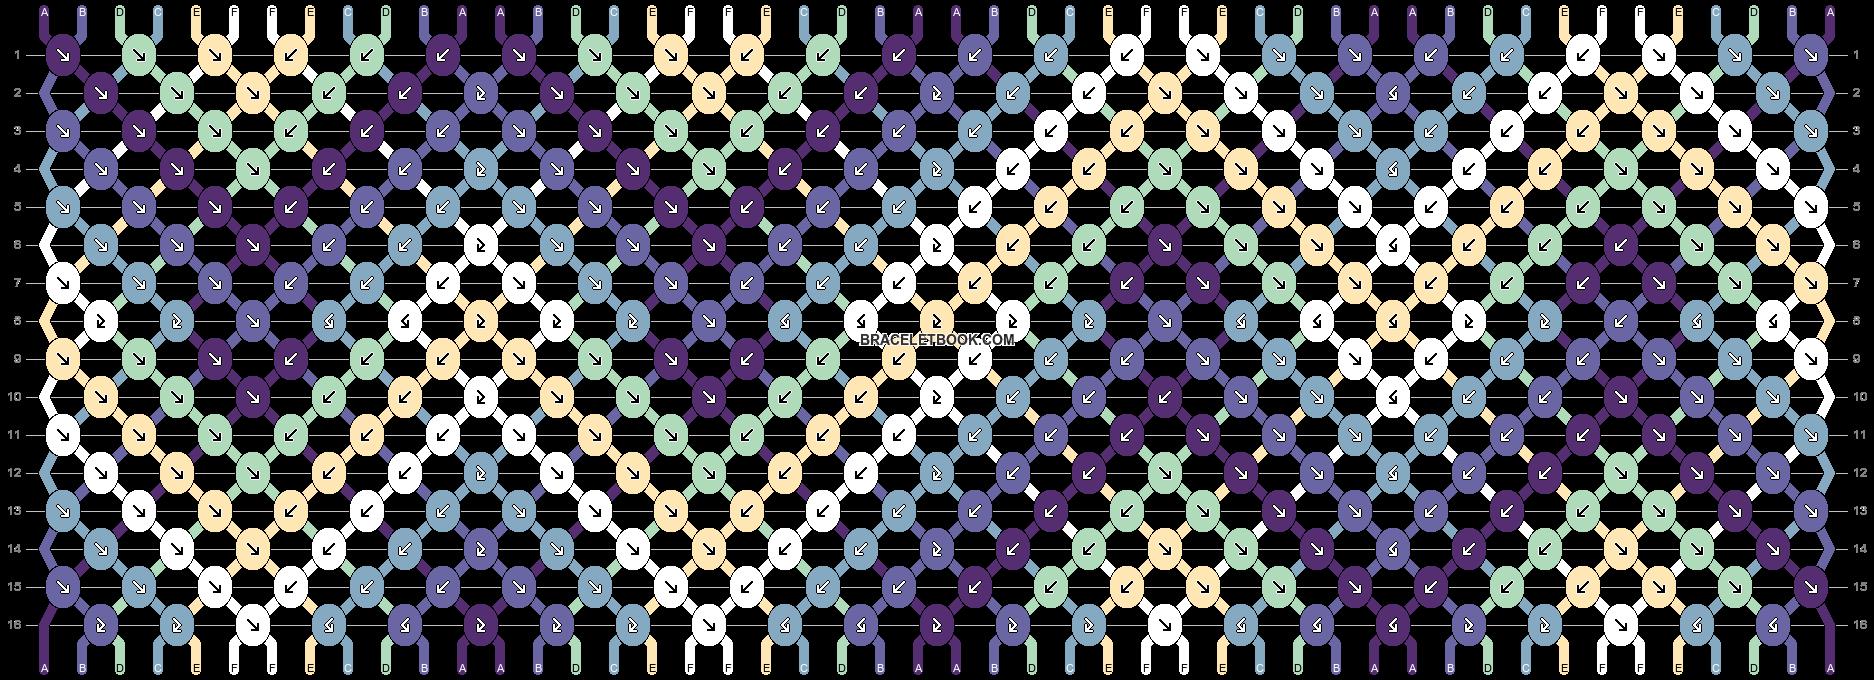 Normal pattern #40643 pattern